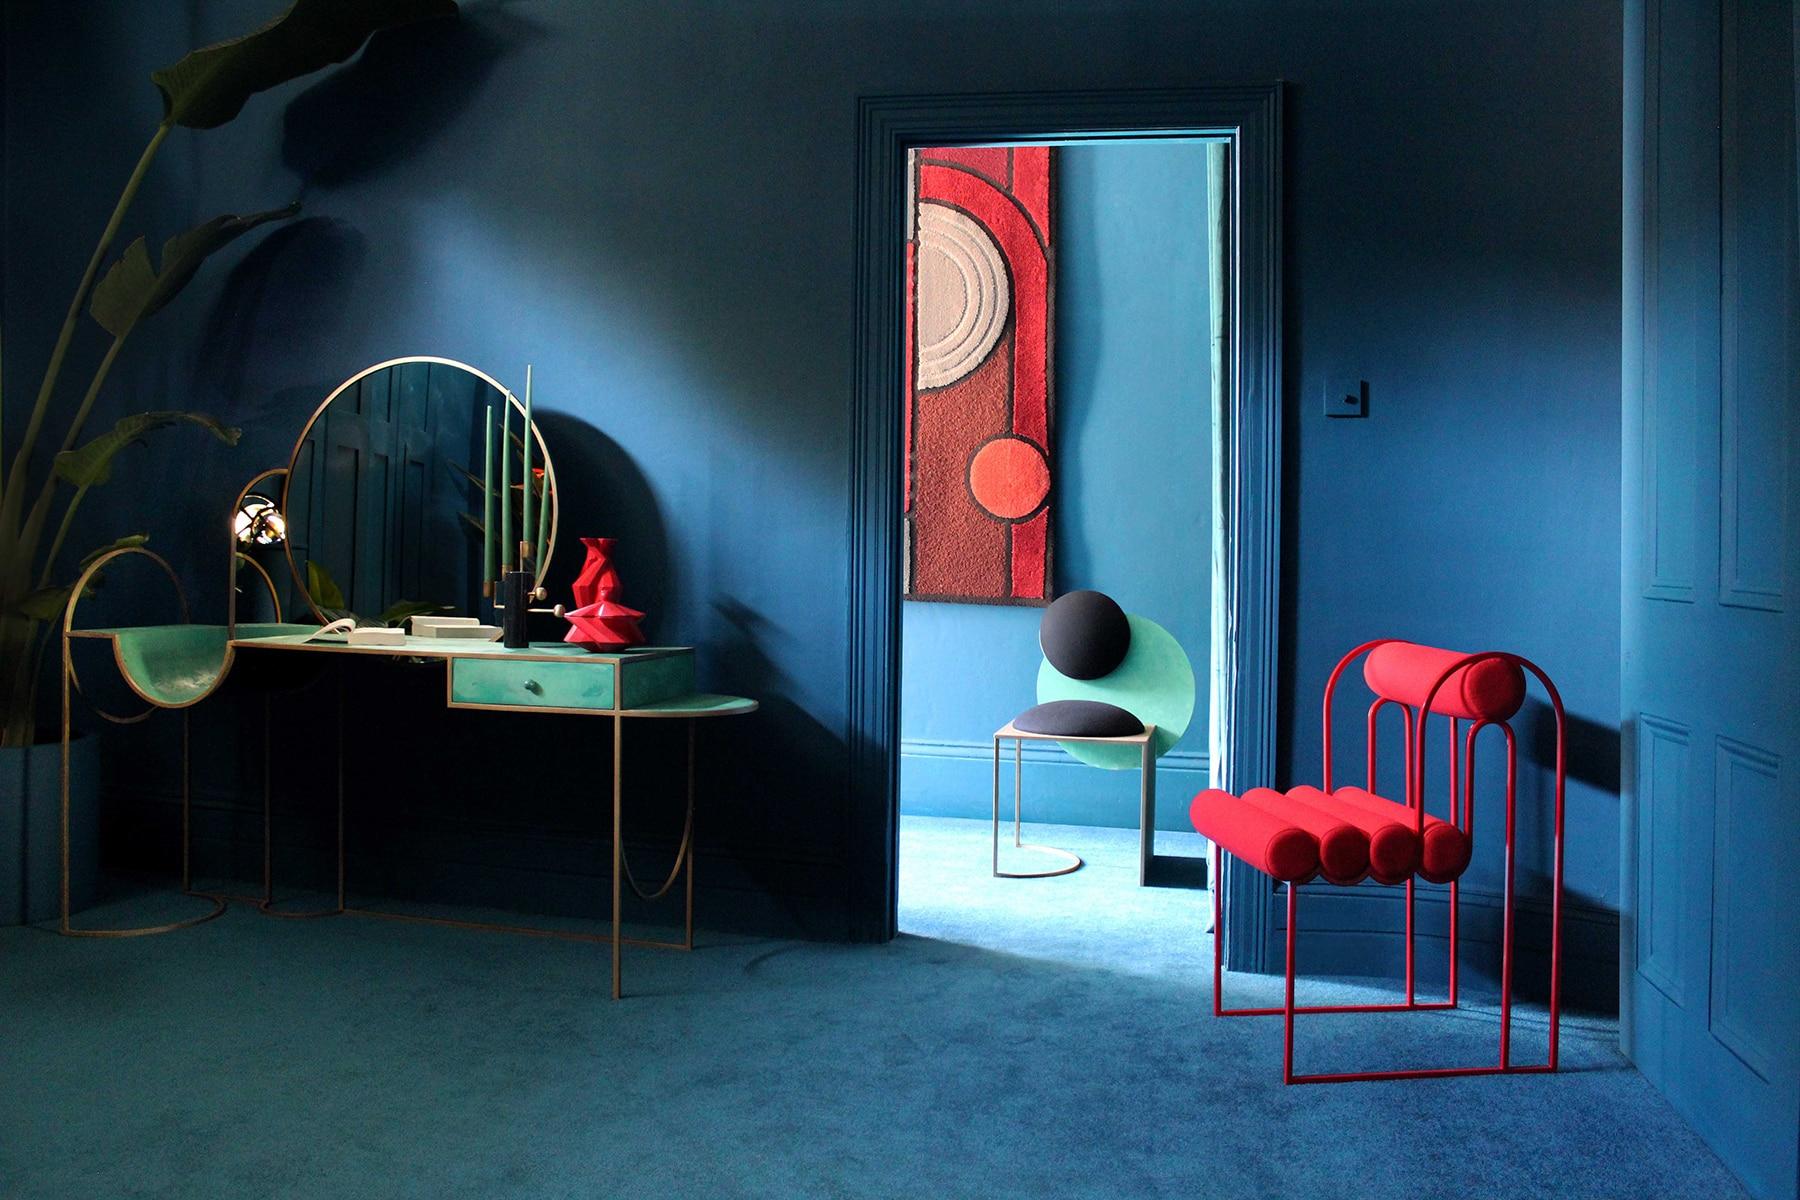 Bohinc Studio Lunar House installation